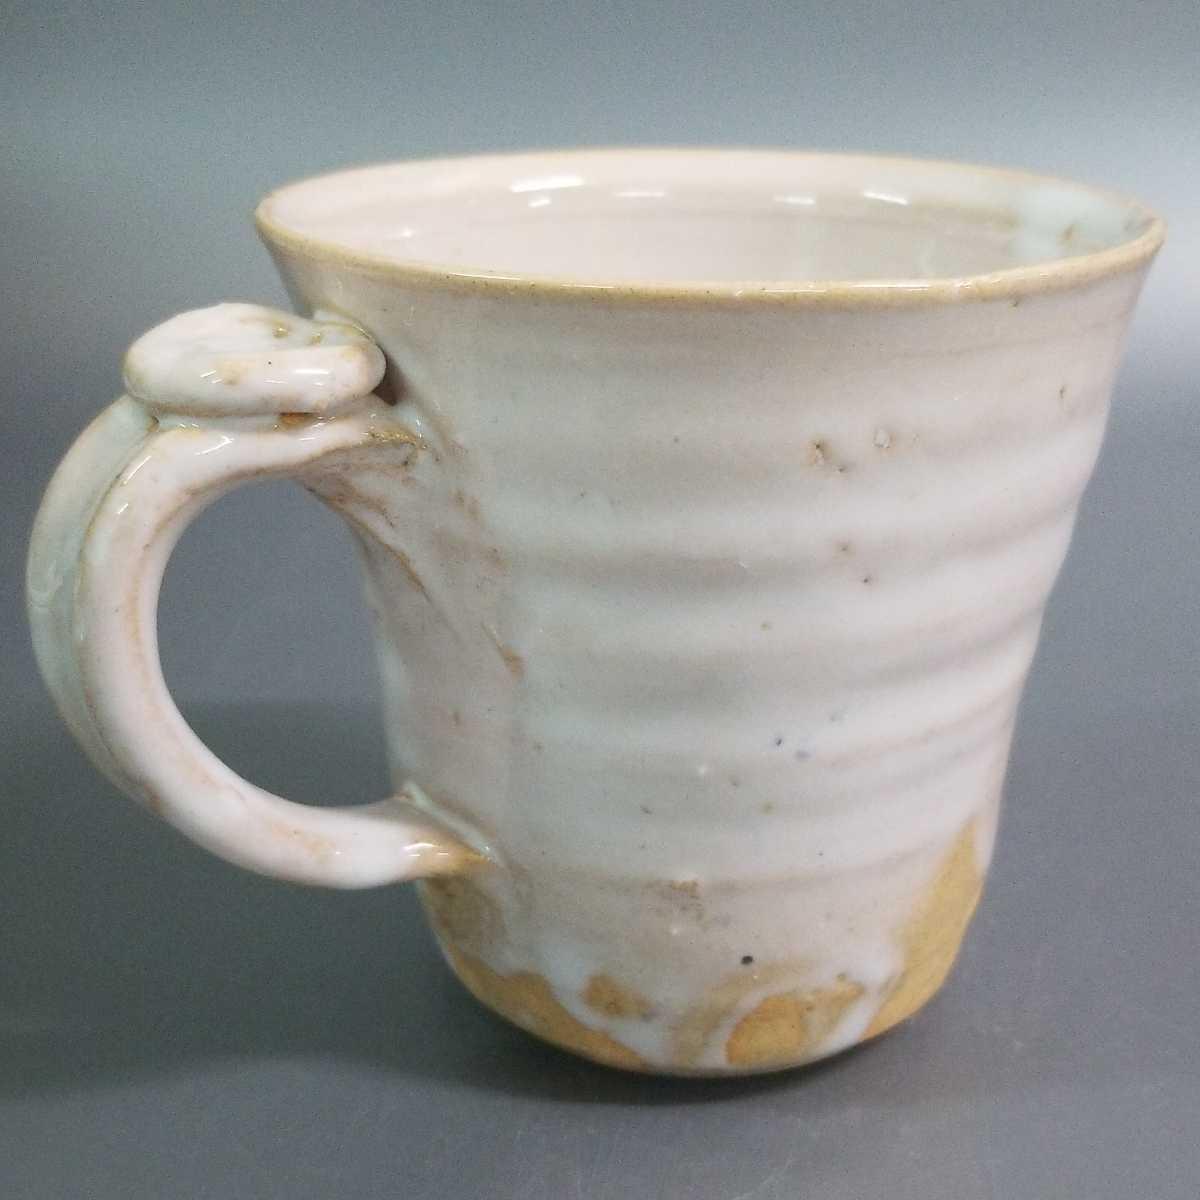 賜67)萩焼 渋谷泥詩 白萩マグカップ 珈琲器 茶器 未使用新品 同梱歓迎 _画像3